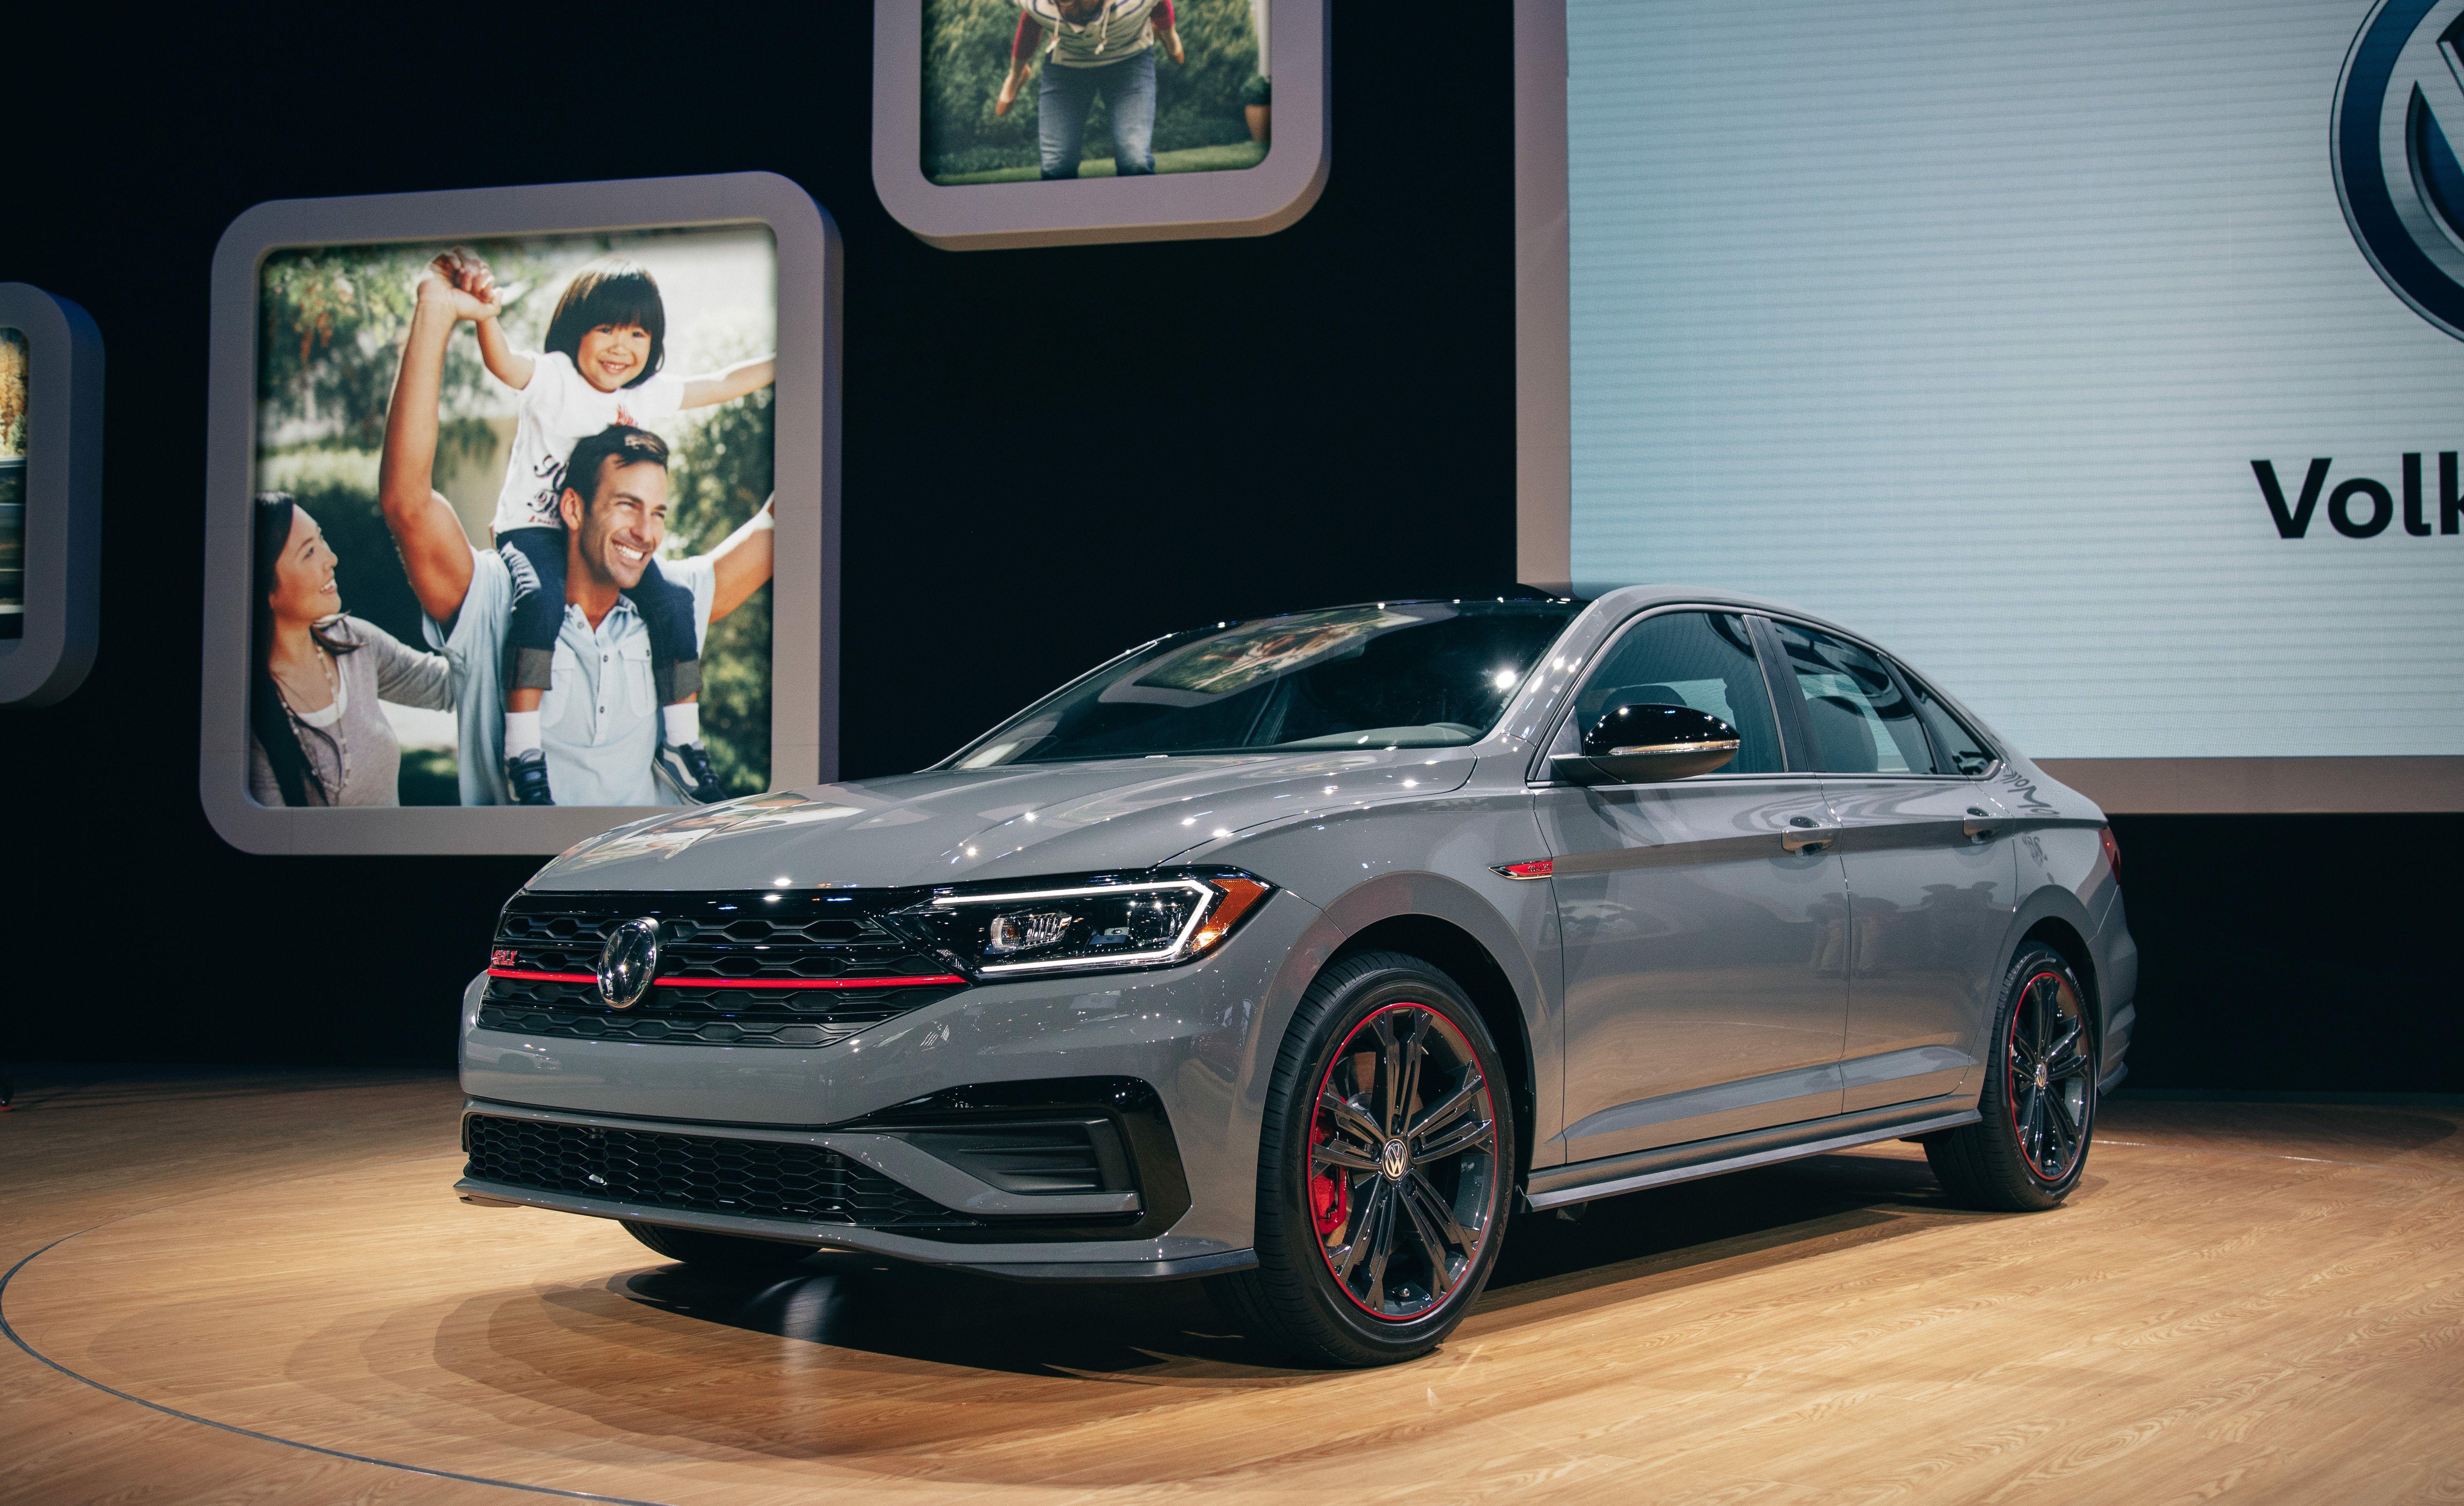 2019 Volkswagen Jetta Gli Reviews Price Photos And Specs Car Driver